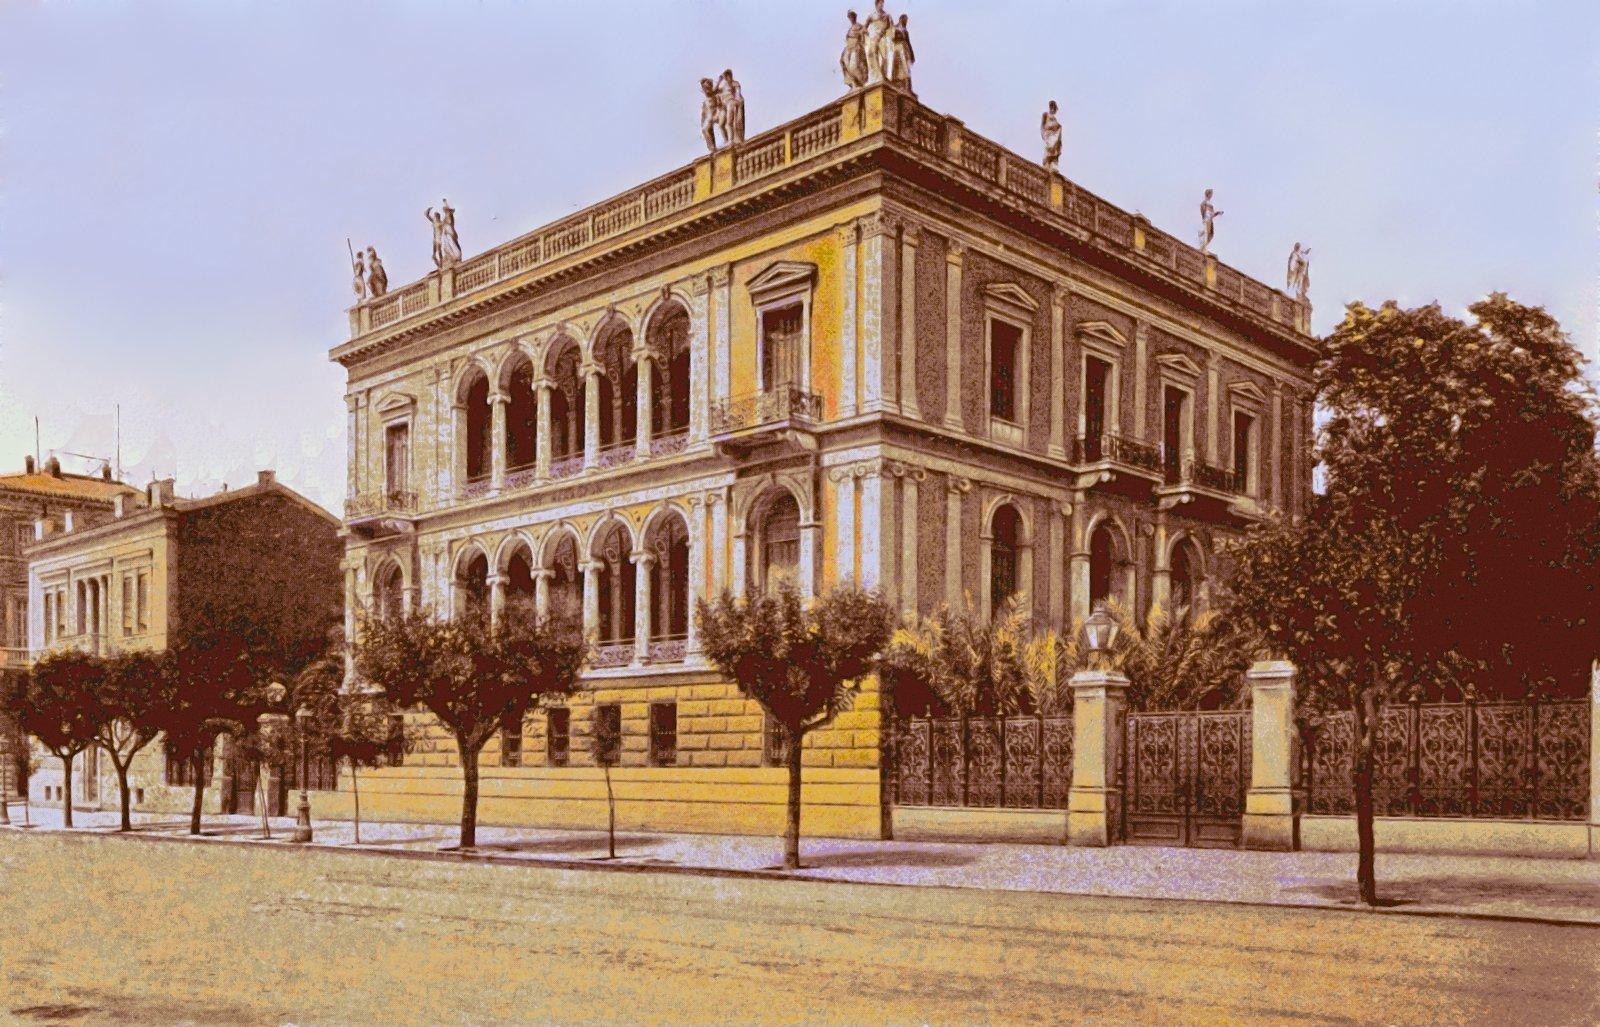 The Iliou Melathron mansion in 1910. Source: Martin Baldwin-Edwards (digital enhancements) - anonymous postcard, personal collection of Martin Baldwin-Edwards